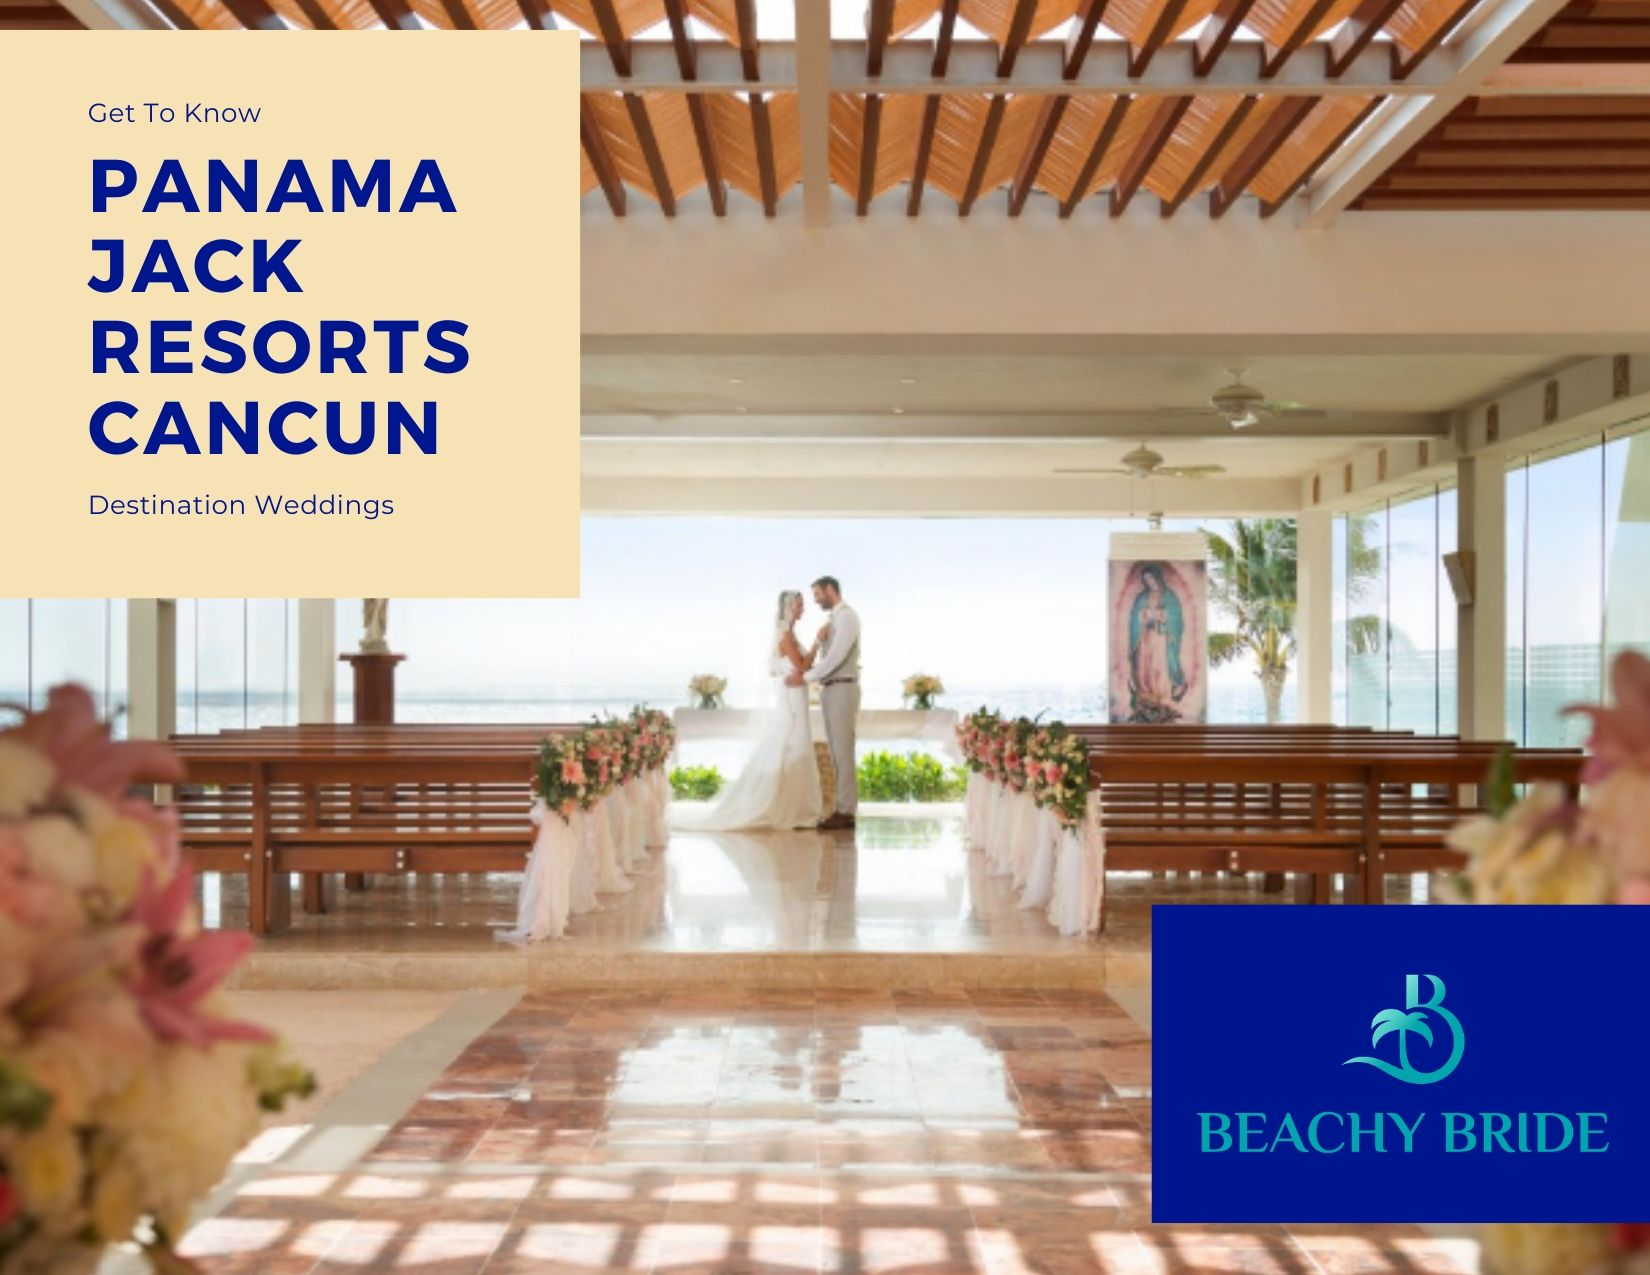 Weddings at Panama Jack Resorts in Cancun. 'image'